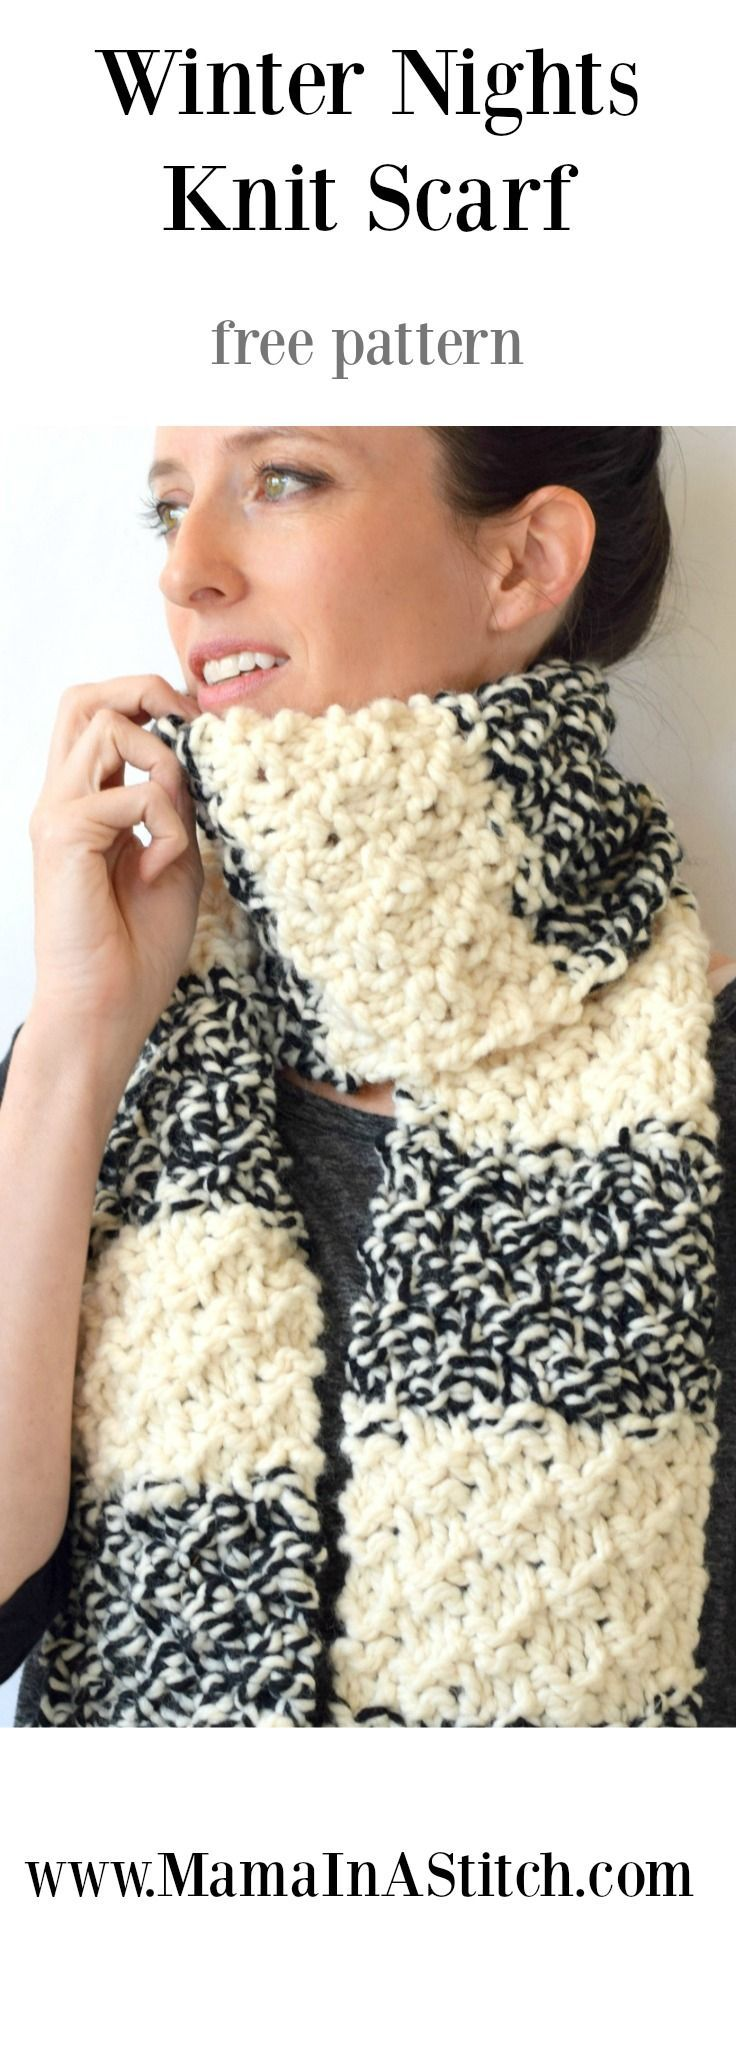 Winter Nights Easy Knit Scarf Pattern via @MamaInAStitch free ...